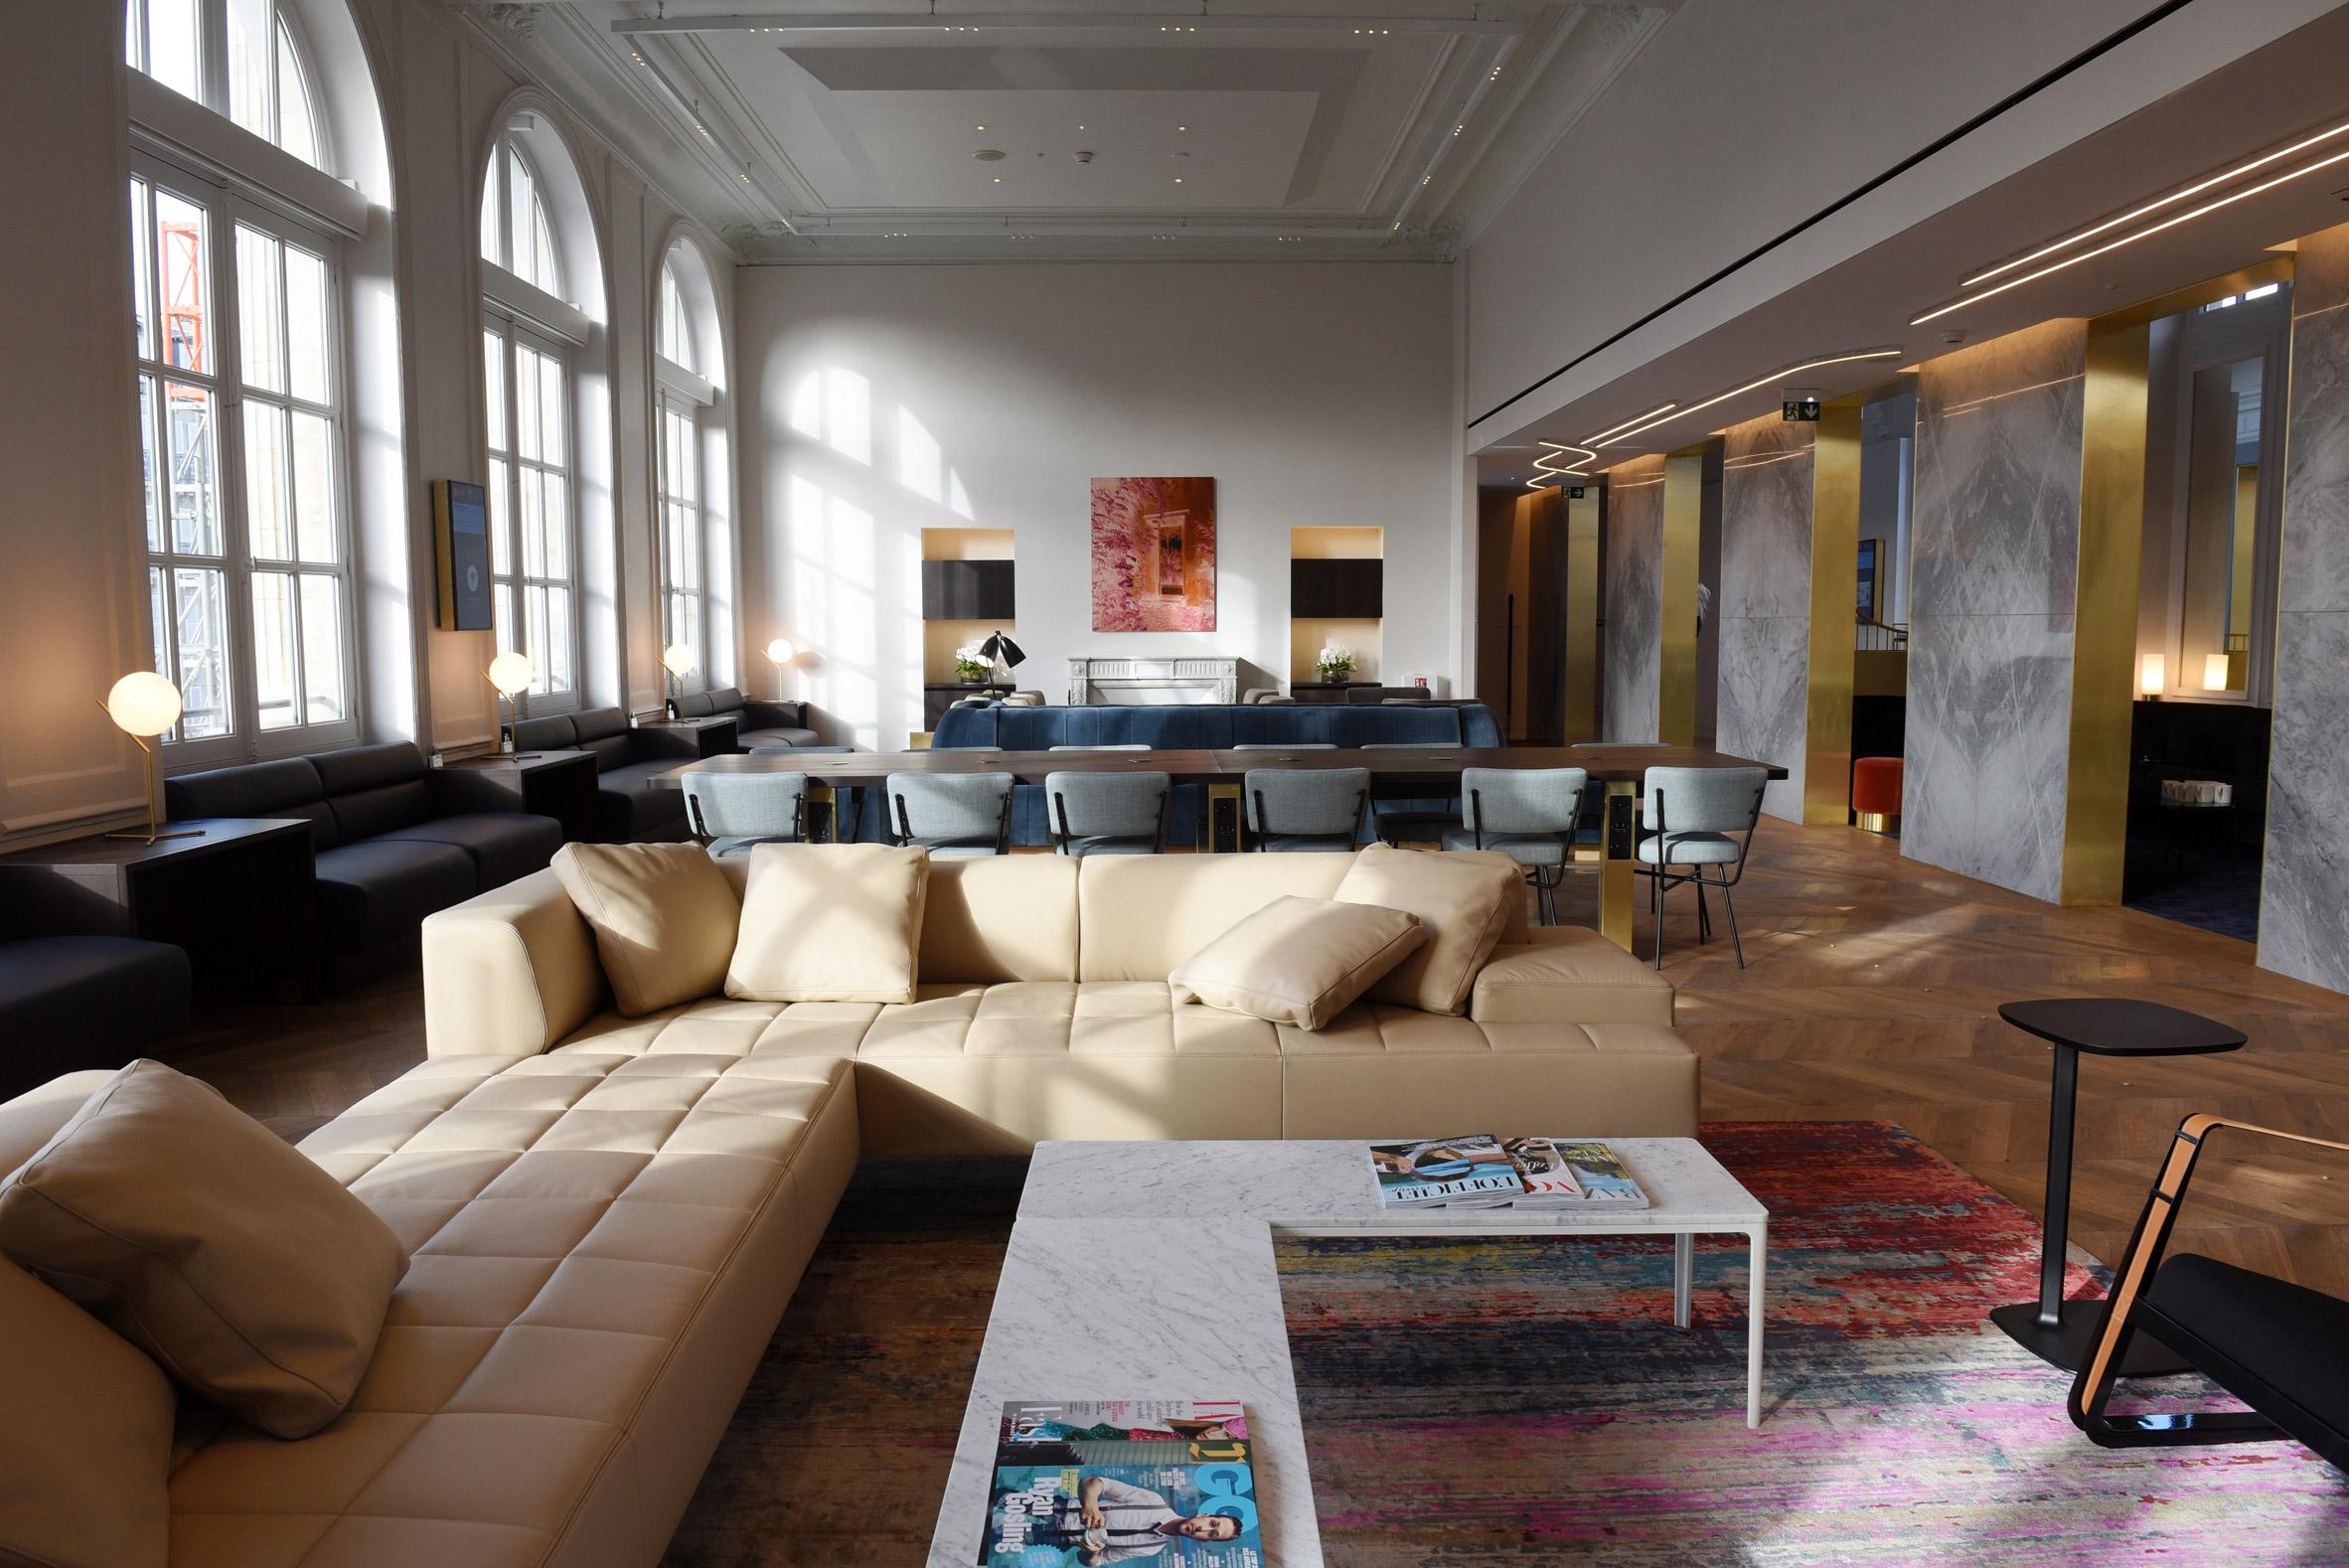 London Studio Softroom designs luxurious Eurostar Lounge in Paris eurostar lounge in paris London Studio Softroom designs luxurious Eurostar Lounge in Paris London Studio Softroom designs luxurious Eurostar Lounge in Paris 2